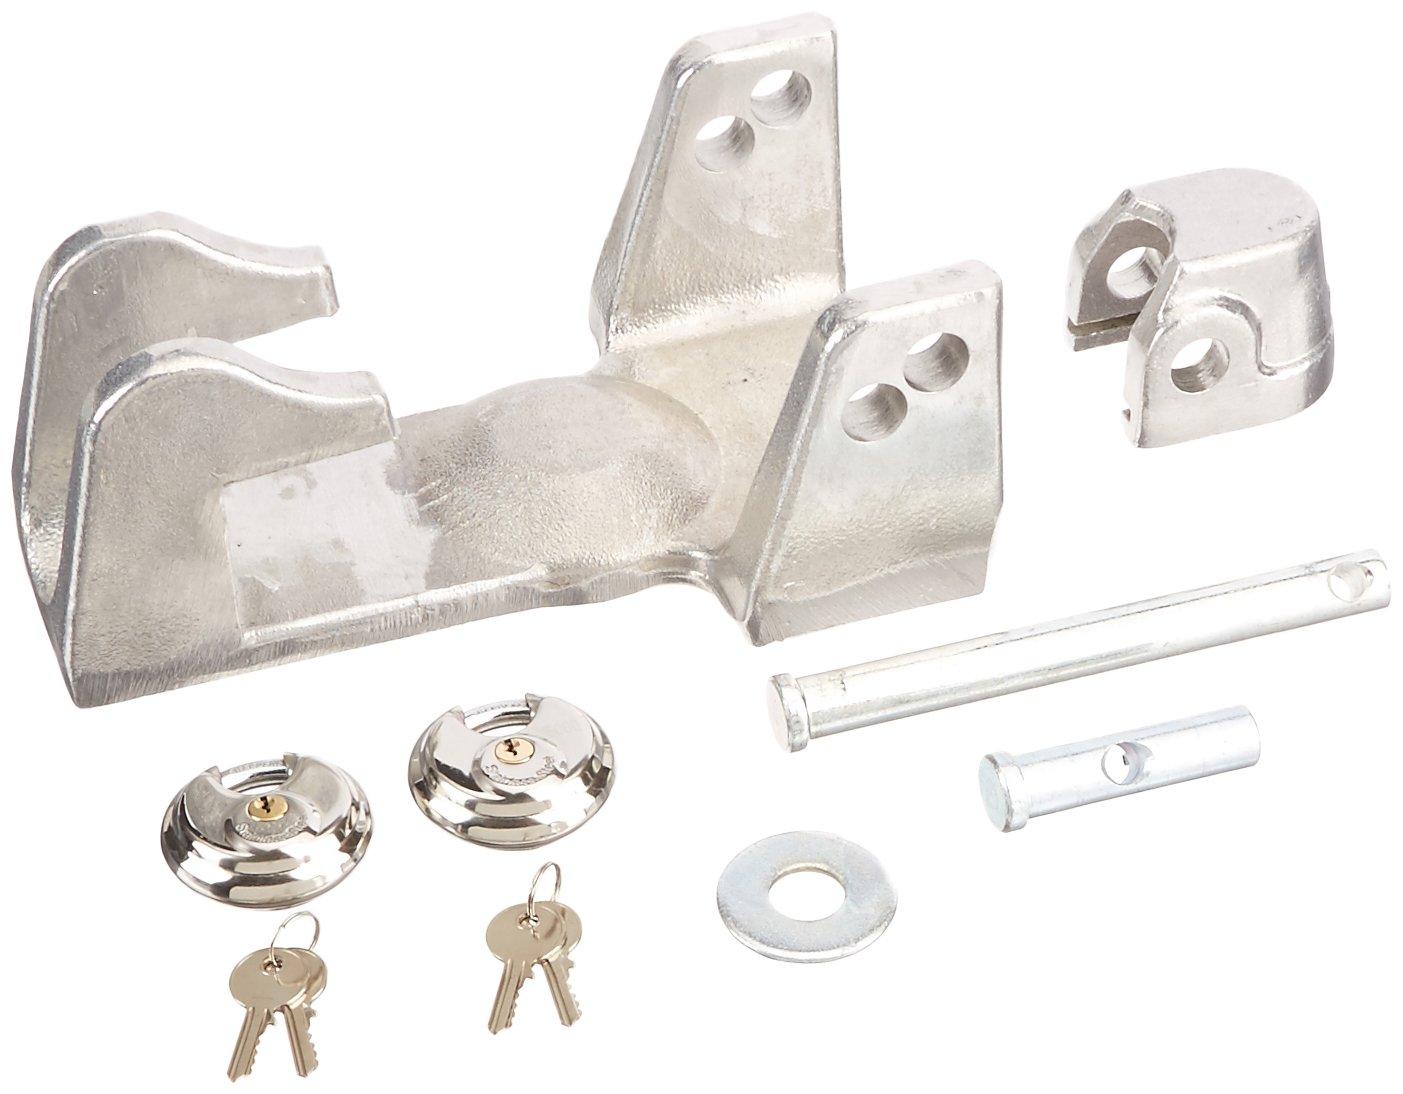 Blaylock American Metal TL-53 Coupler Lock by Blaylock American Metal